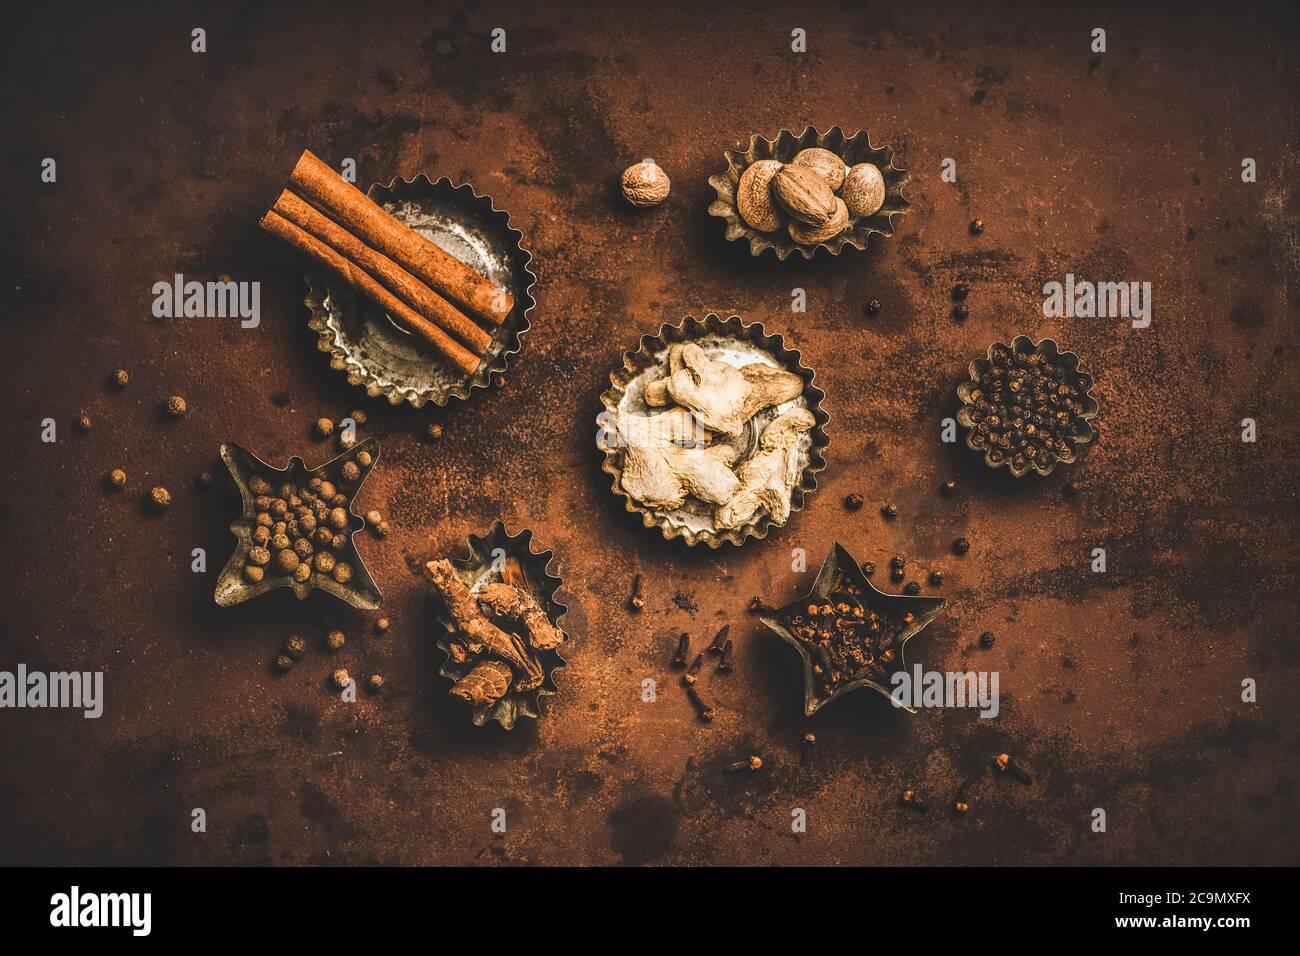 Piso-Lay de la especia turca Yedi Bahar mezcla sobre fondo oxidado Foto de stock